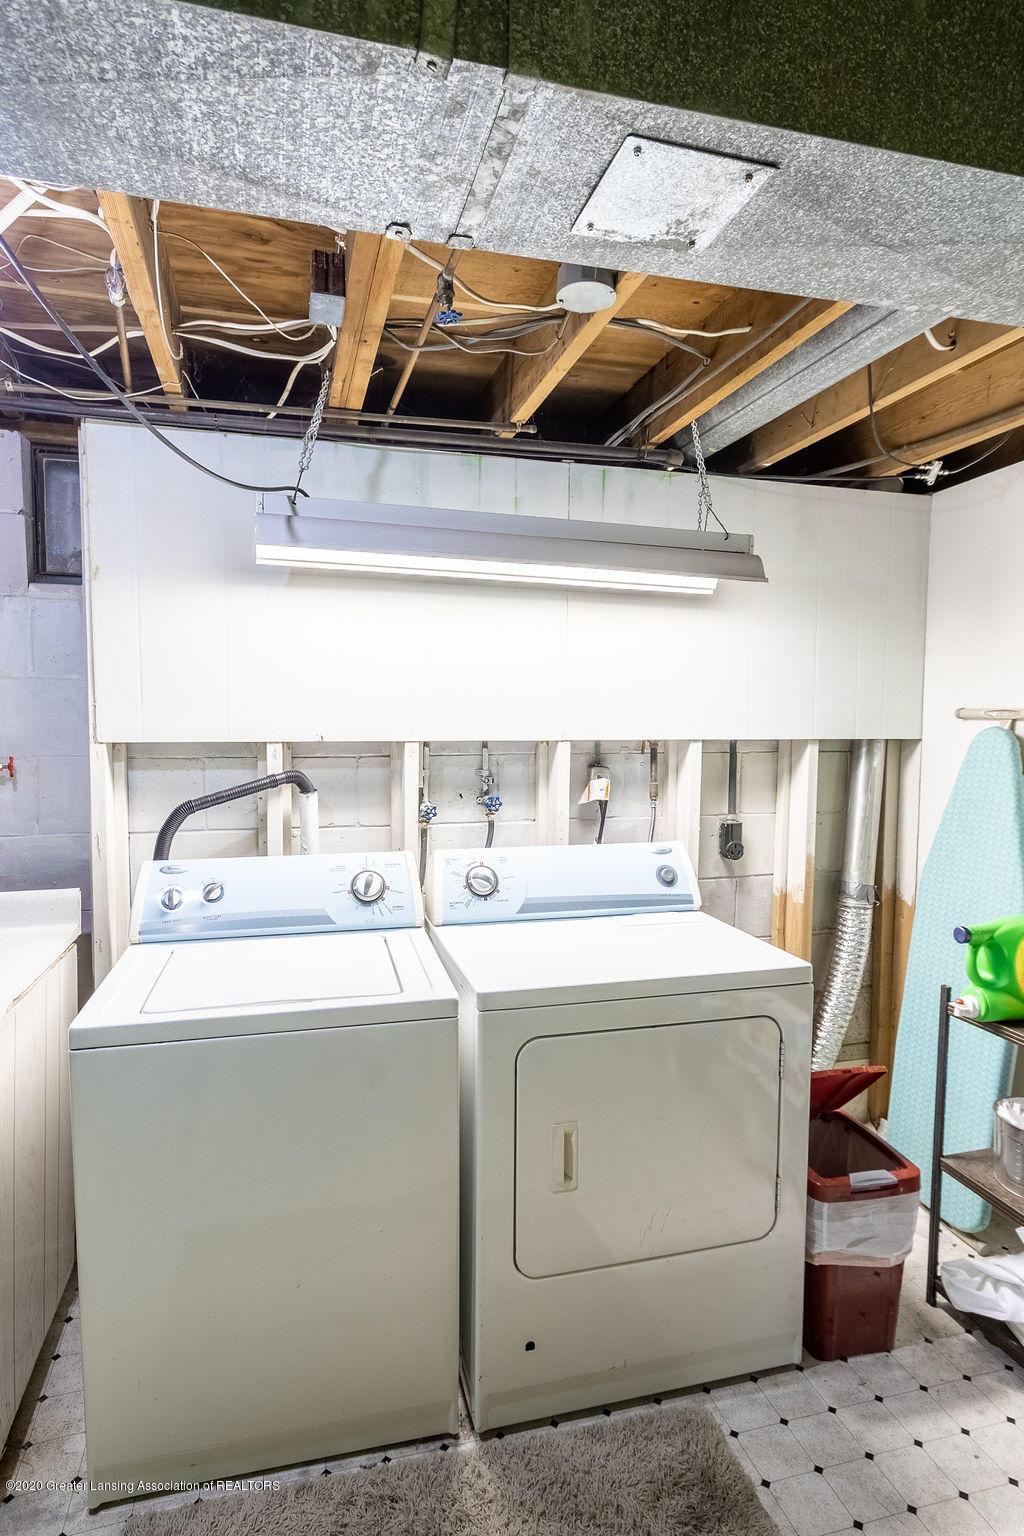 694 John R St - Laundry - 18